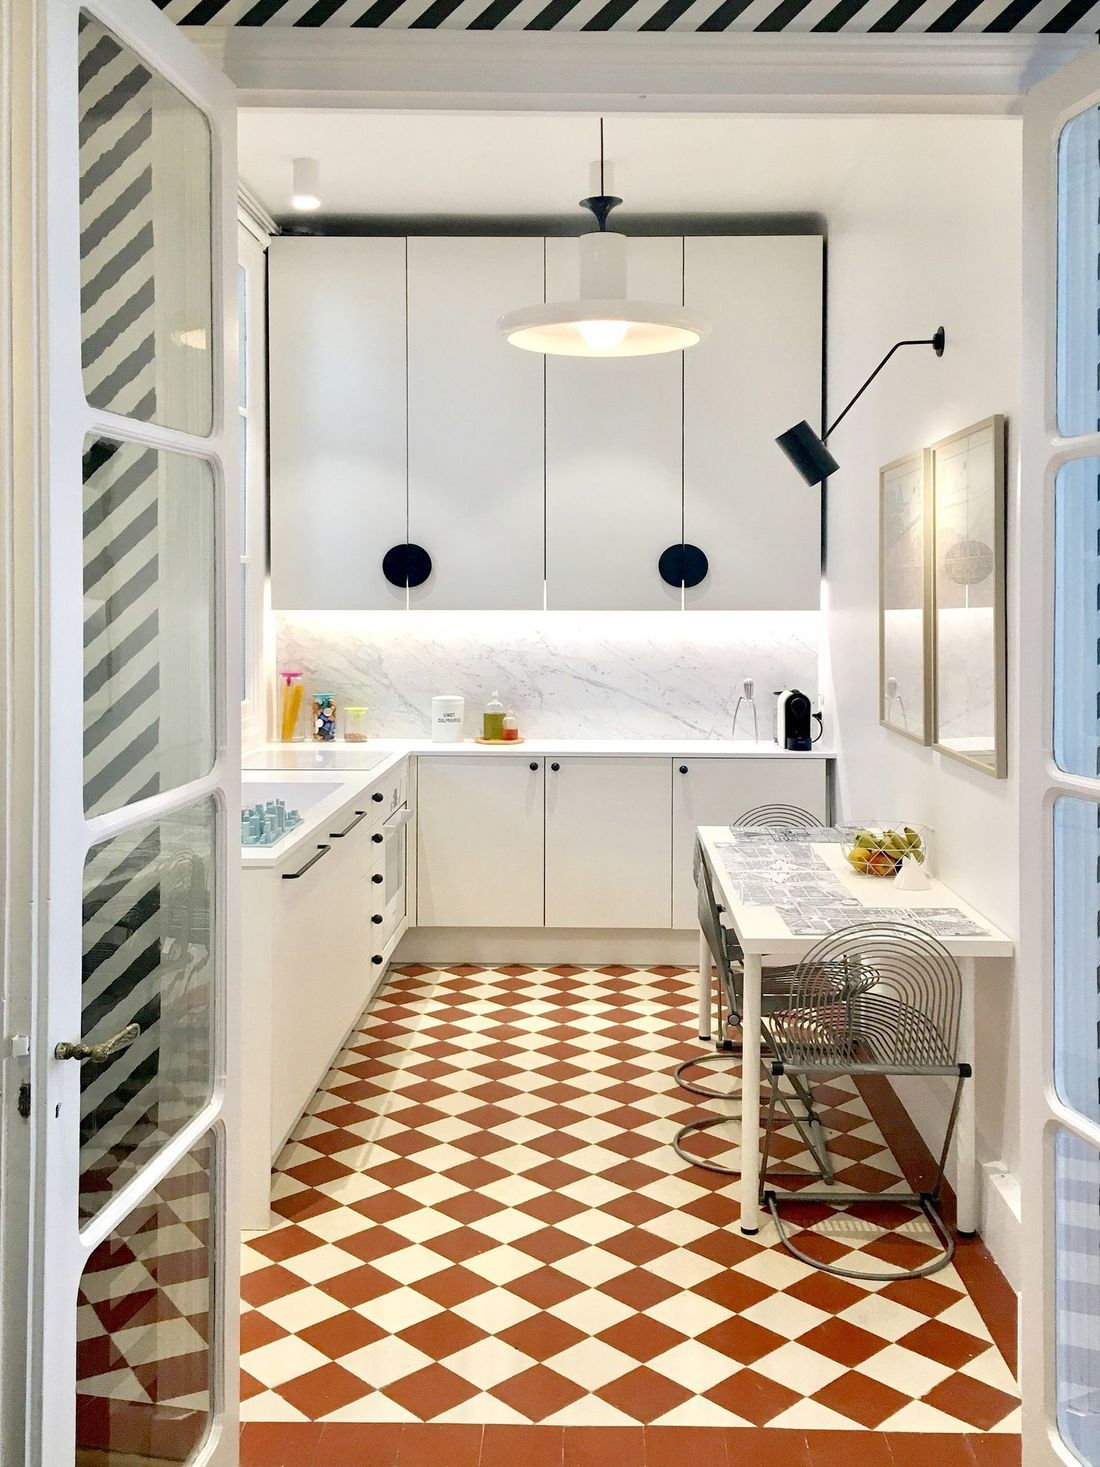 10 Inspiring Parisian Kitchen Design Decor Ideas